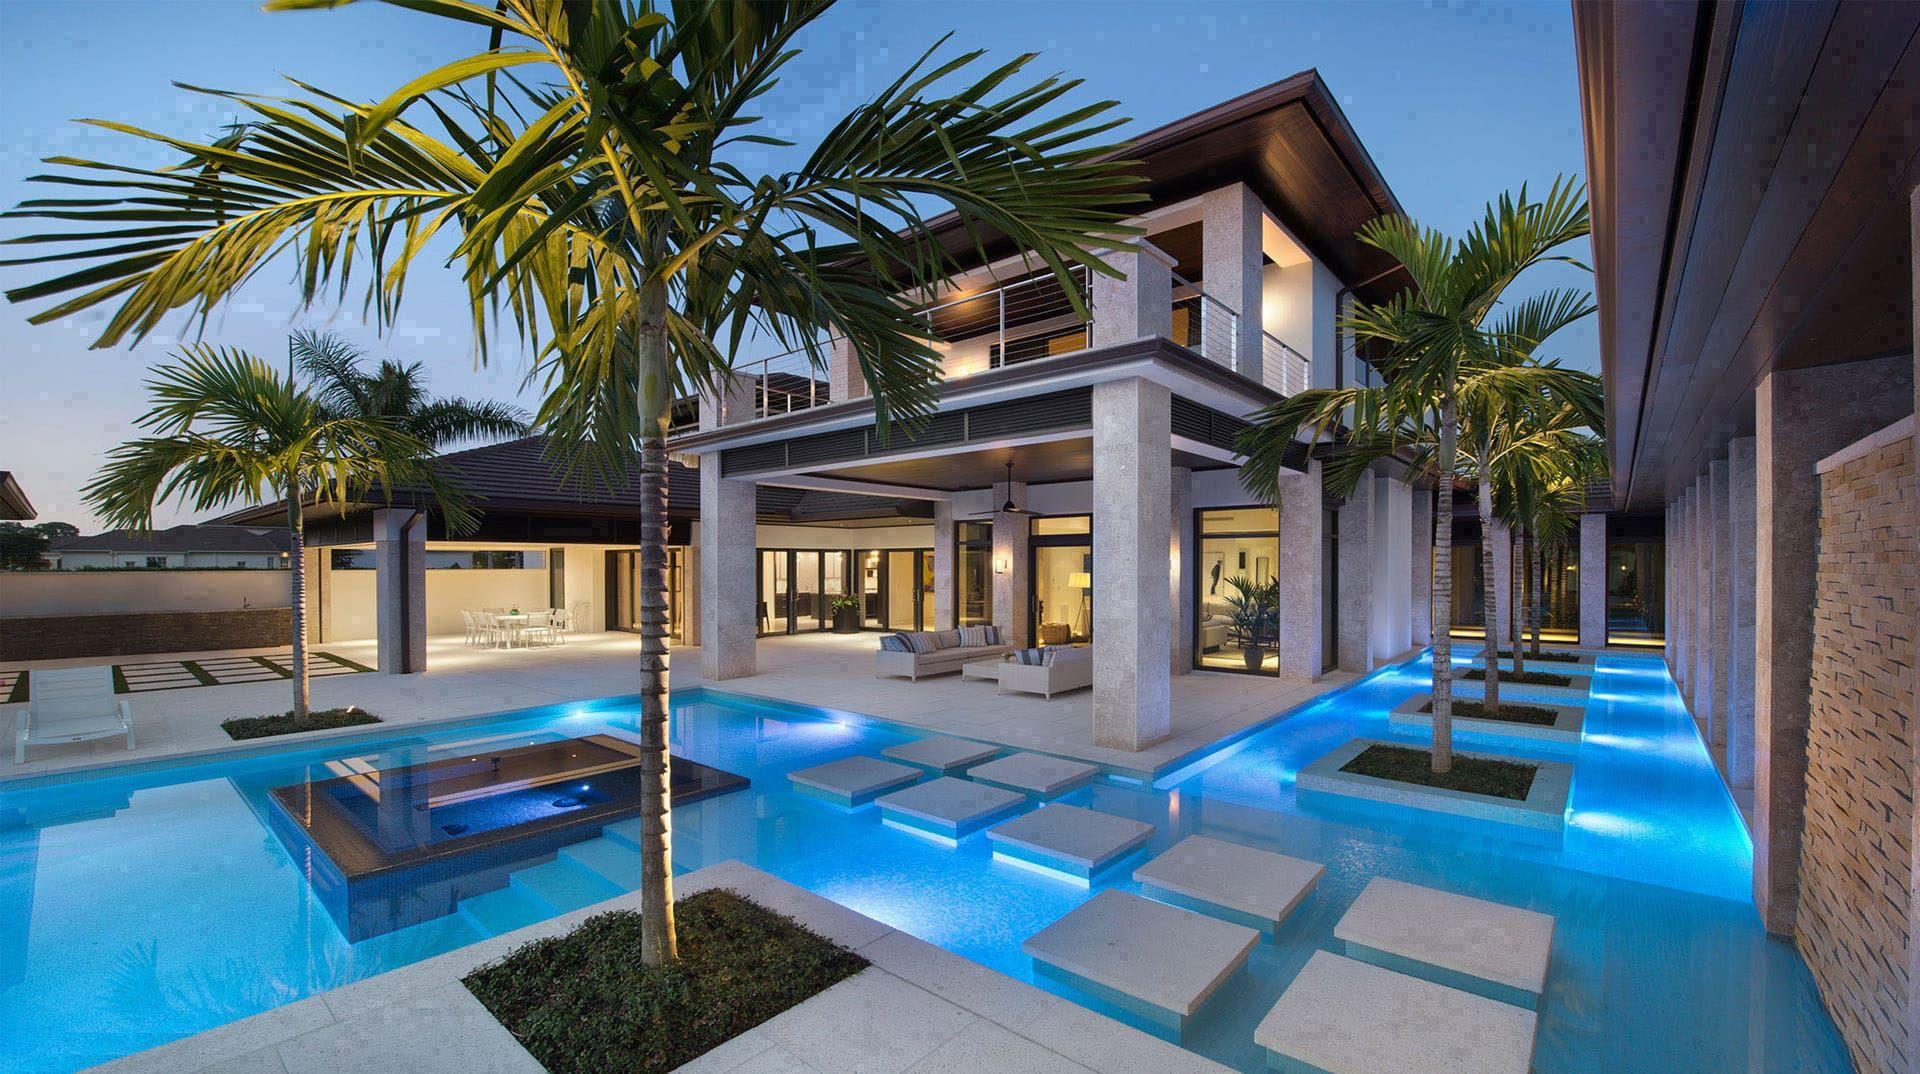 santa rosa beach, santa rosa beach mortgage, santa rosa beach mortgage rates, santa rosa beach mortgage broker, santa rosa beach mortgage lender, mortgage broker near me,